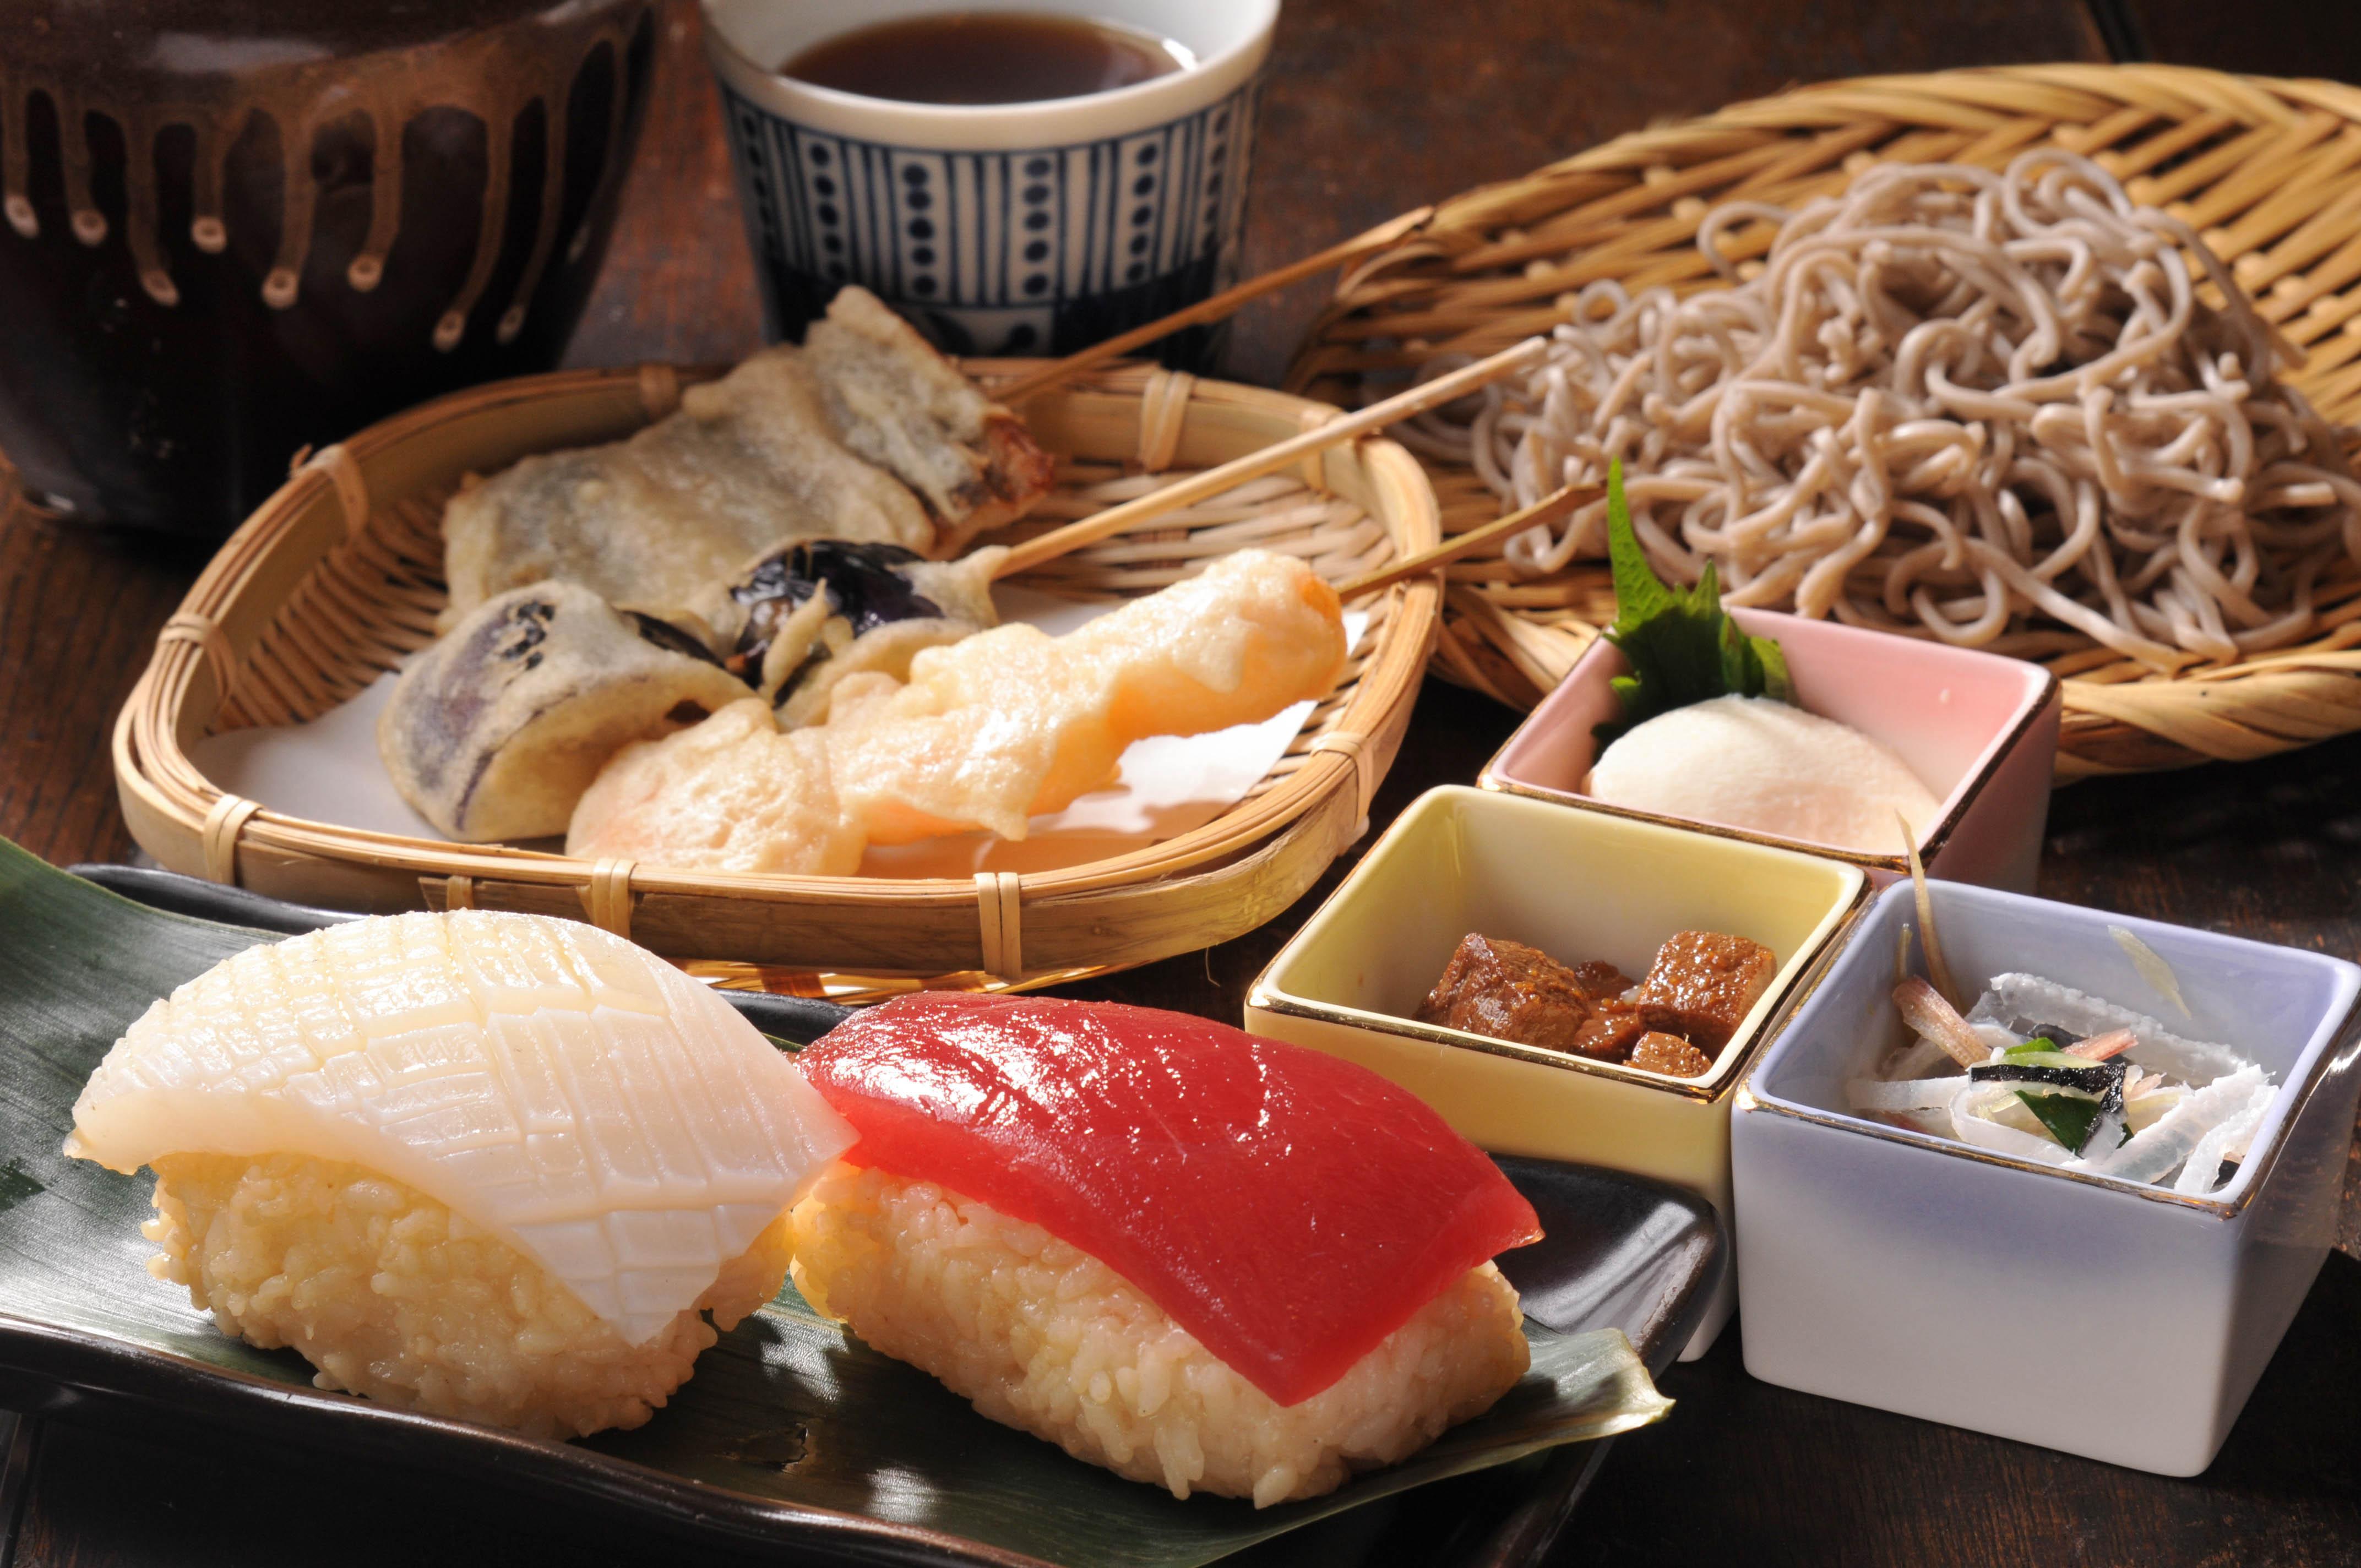 【PR】江戸っ子たちが舌鼓を打った、寿司・天ぷら・蕎麦の三大屋台料理を再現!